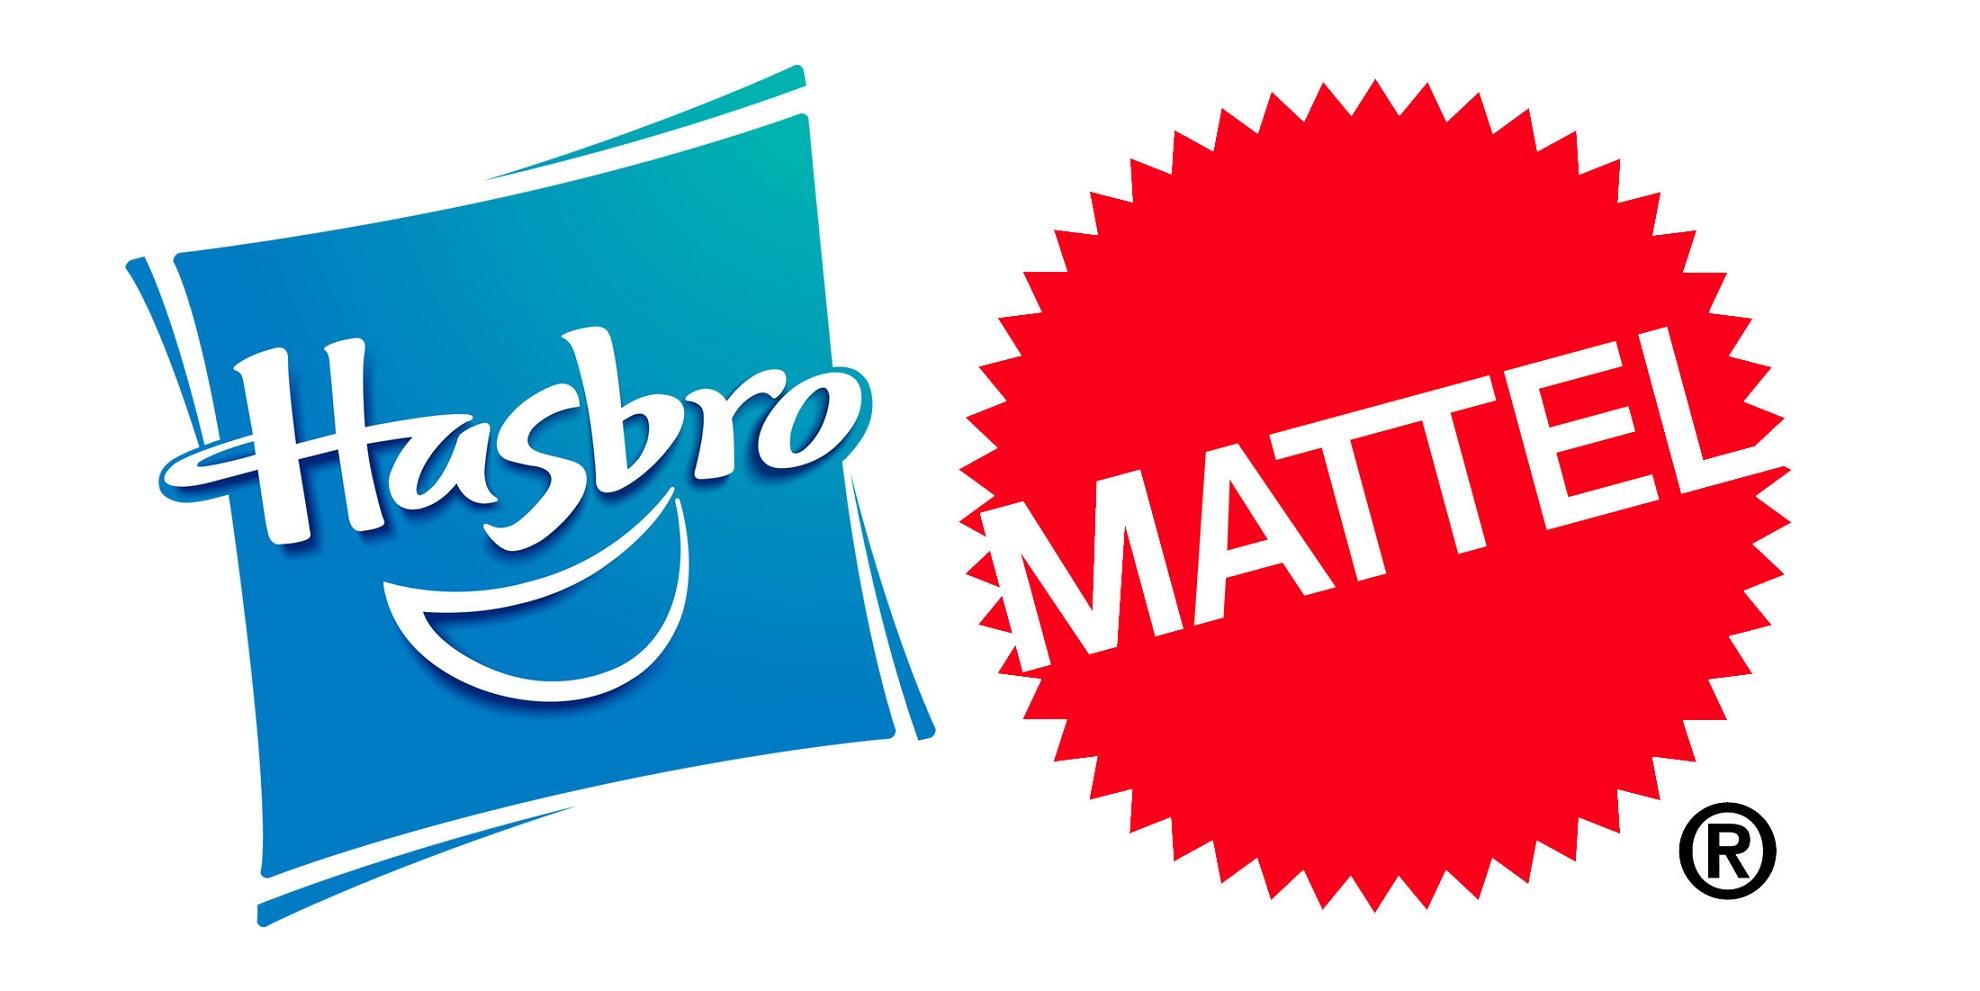 Hasbro y Mattel